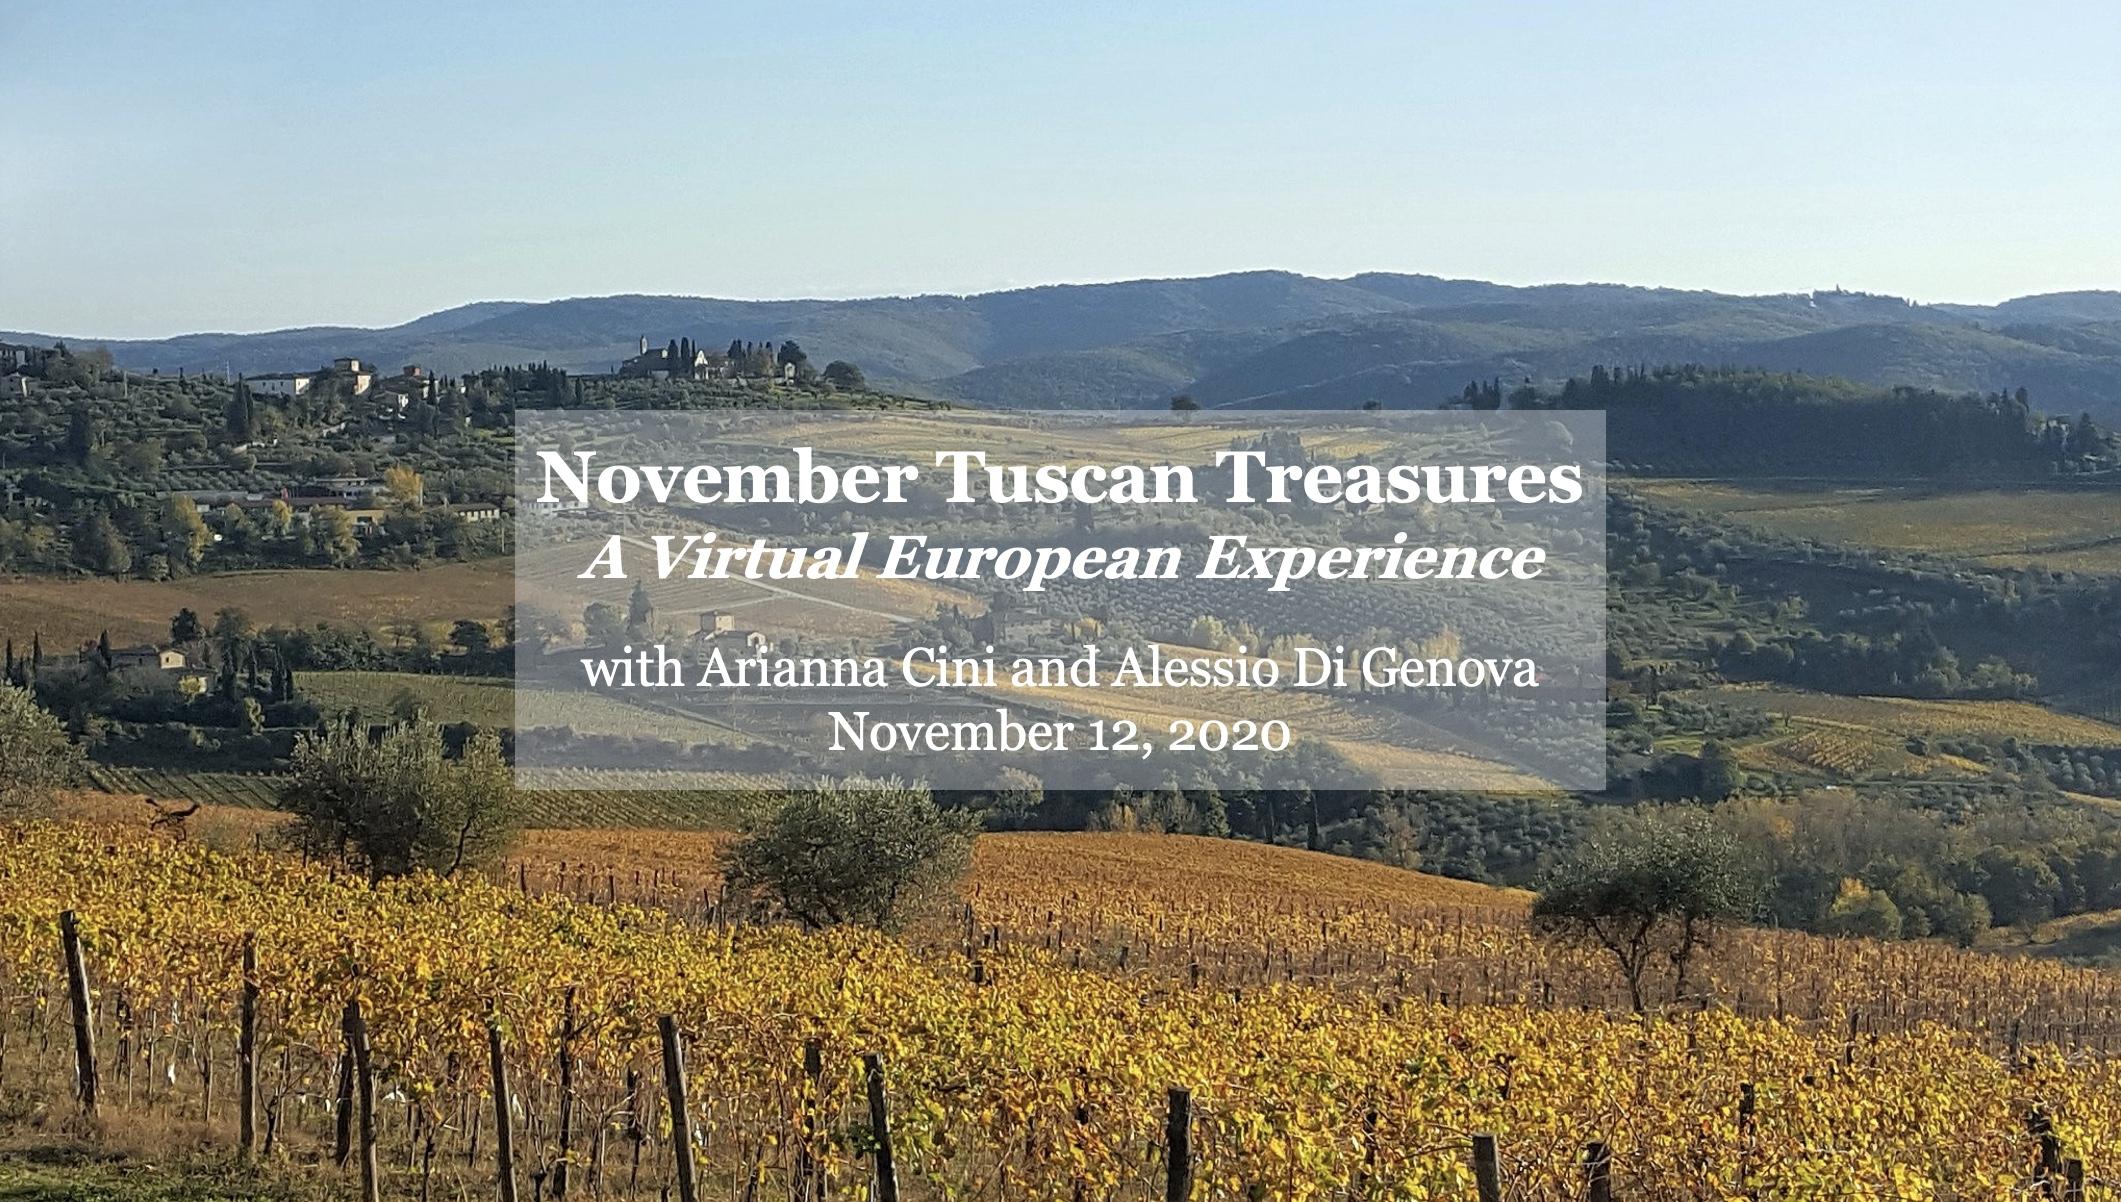 November Tuscan Treasures